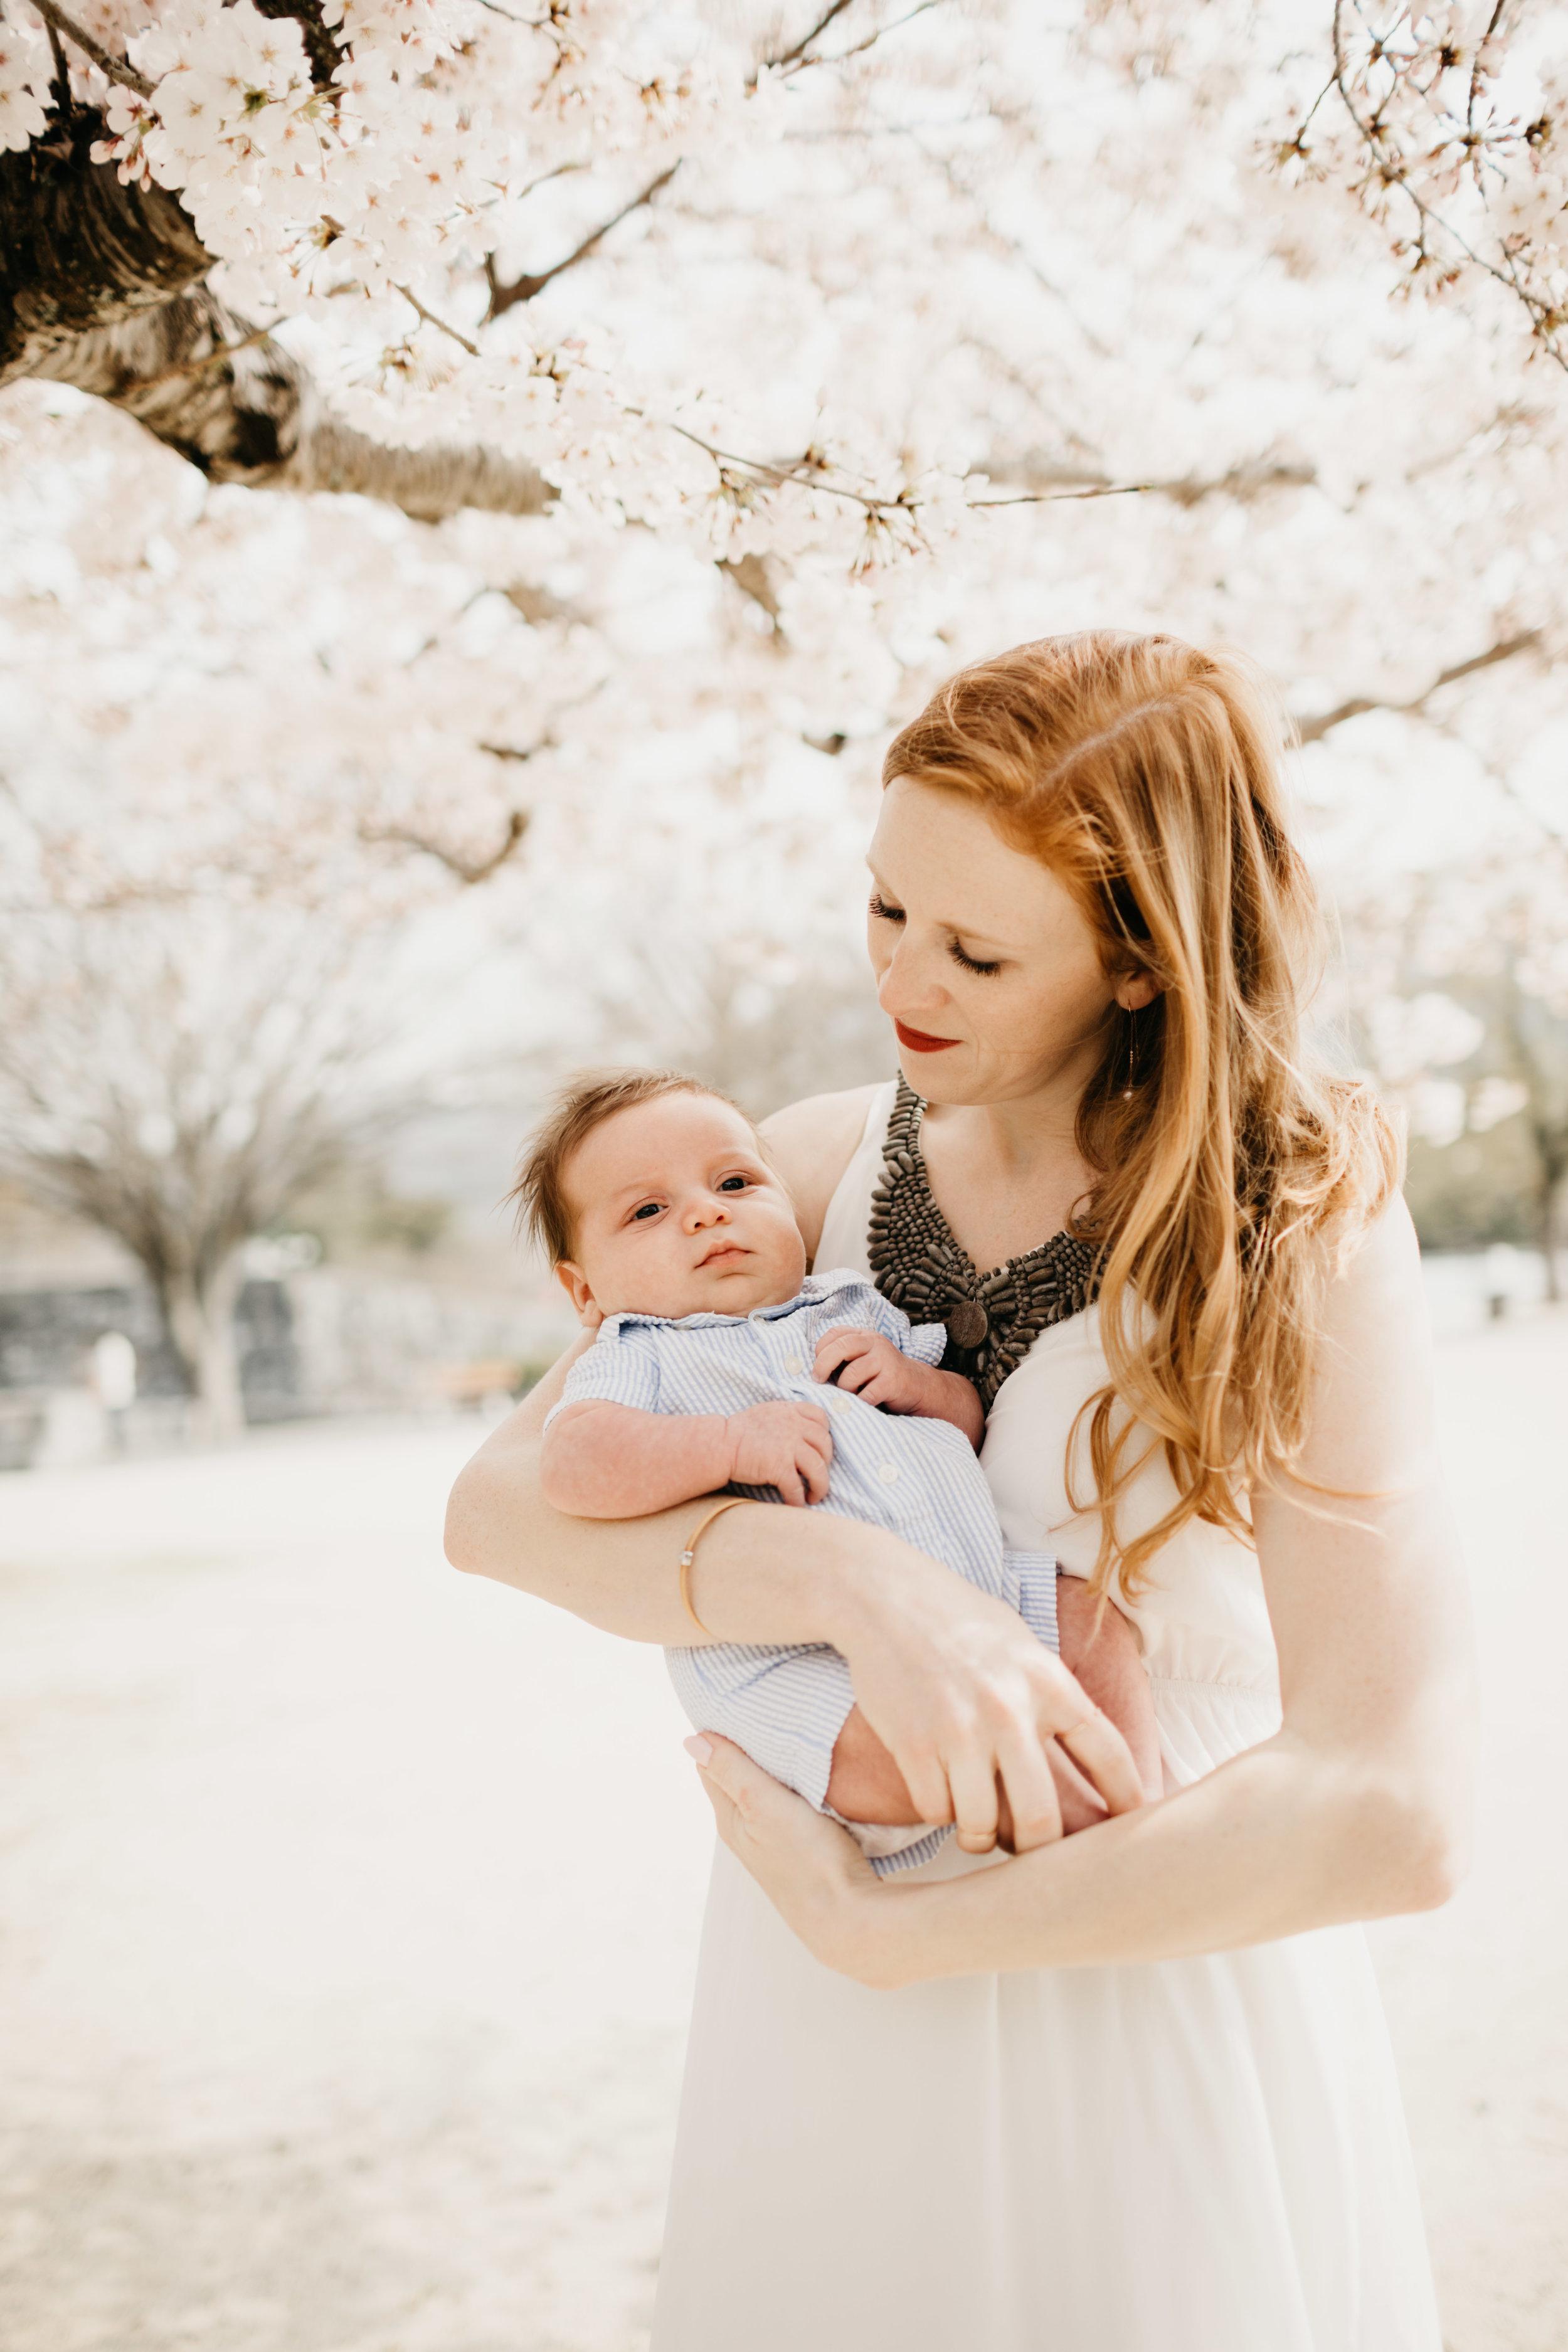 iwkauni-cherry-blossoms-photo-by-samantha-look.jpg